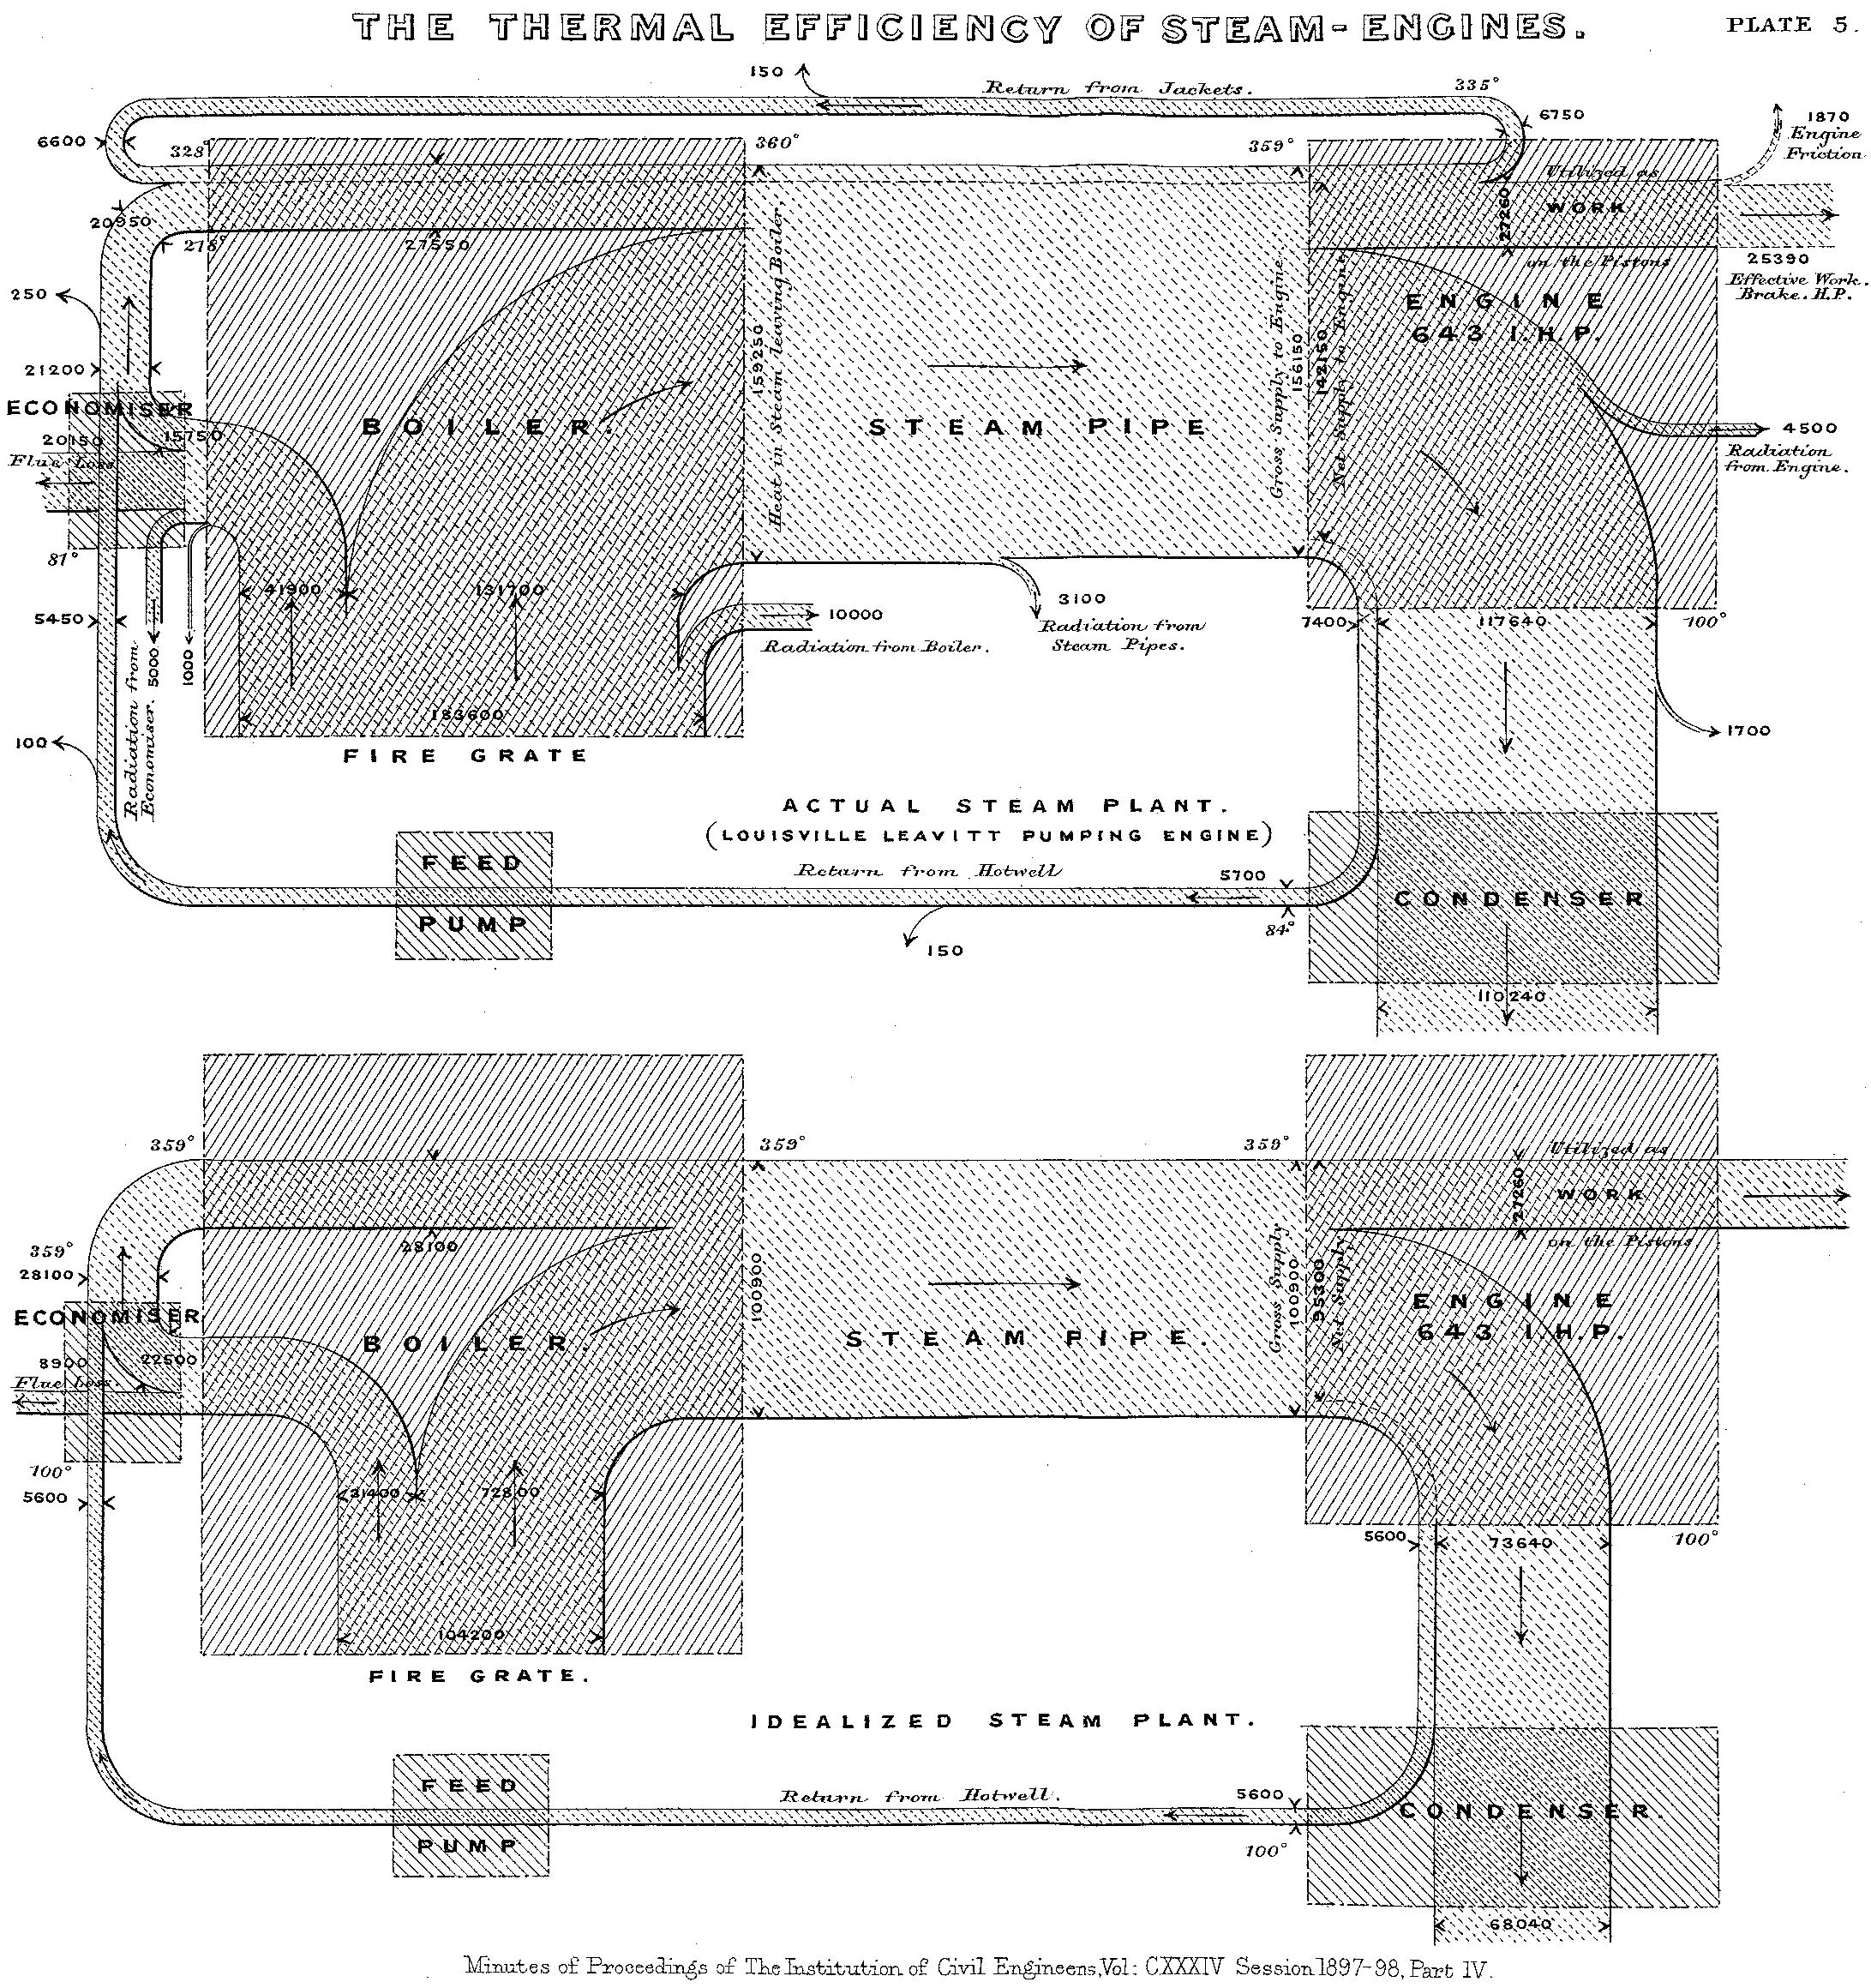 Rysunek 1. Diagram Sankeya Źródło grafiki: Wikipedia (https://pl.wikipedia.org/wiki/Plik:JIE_Sankey_V5_Fig1.png).